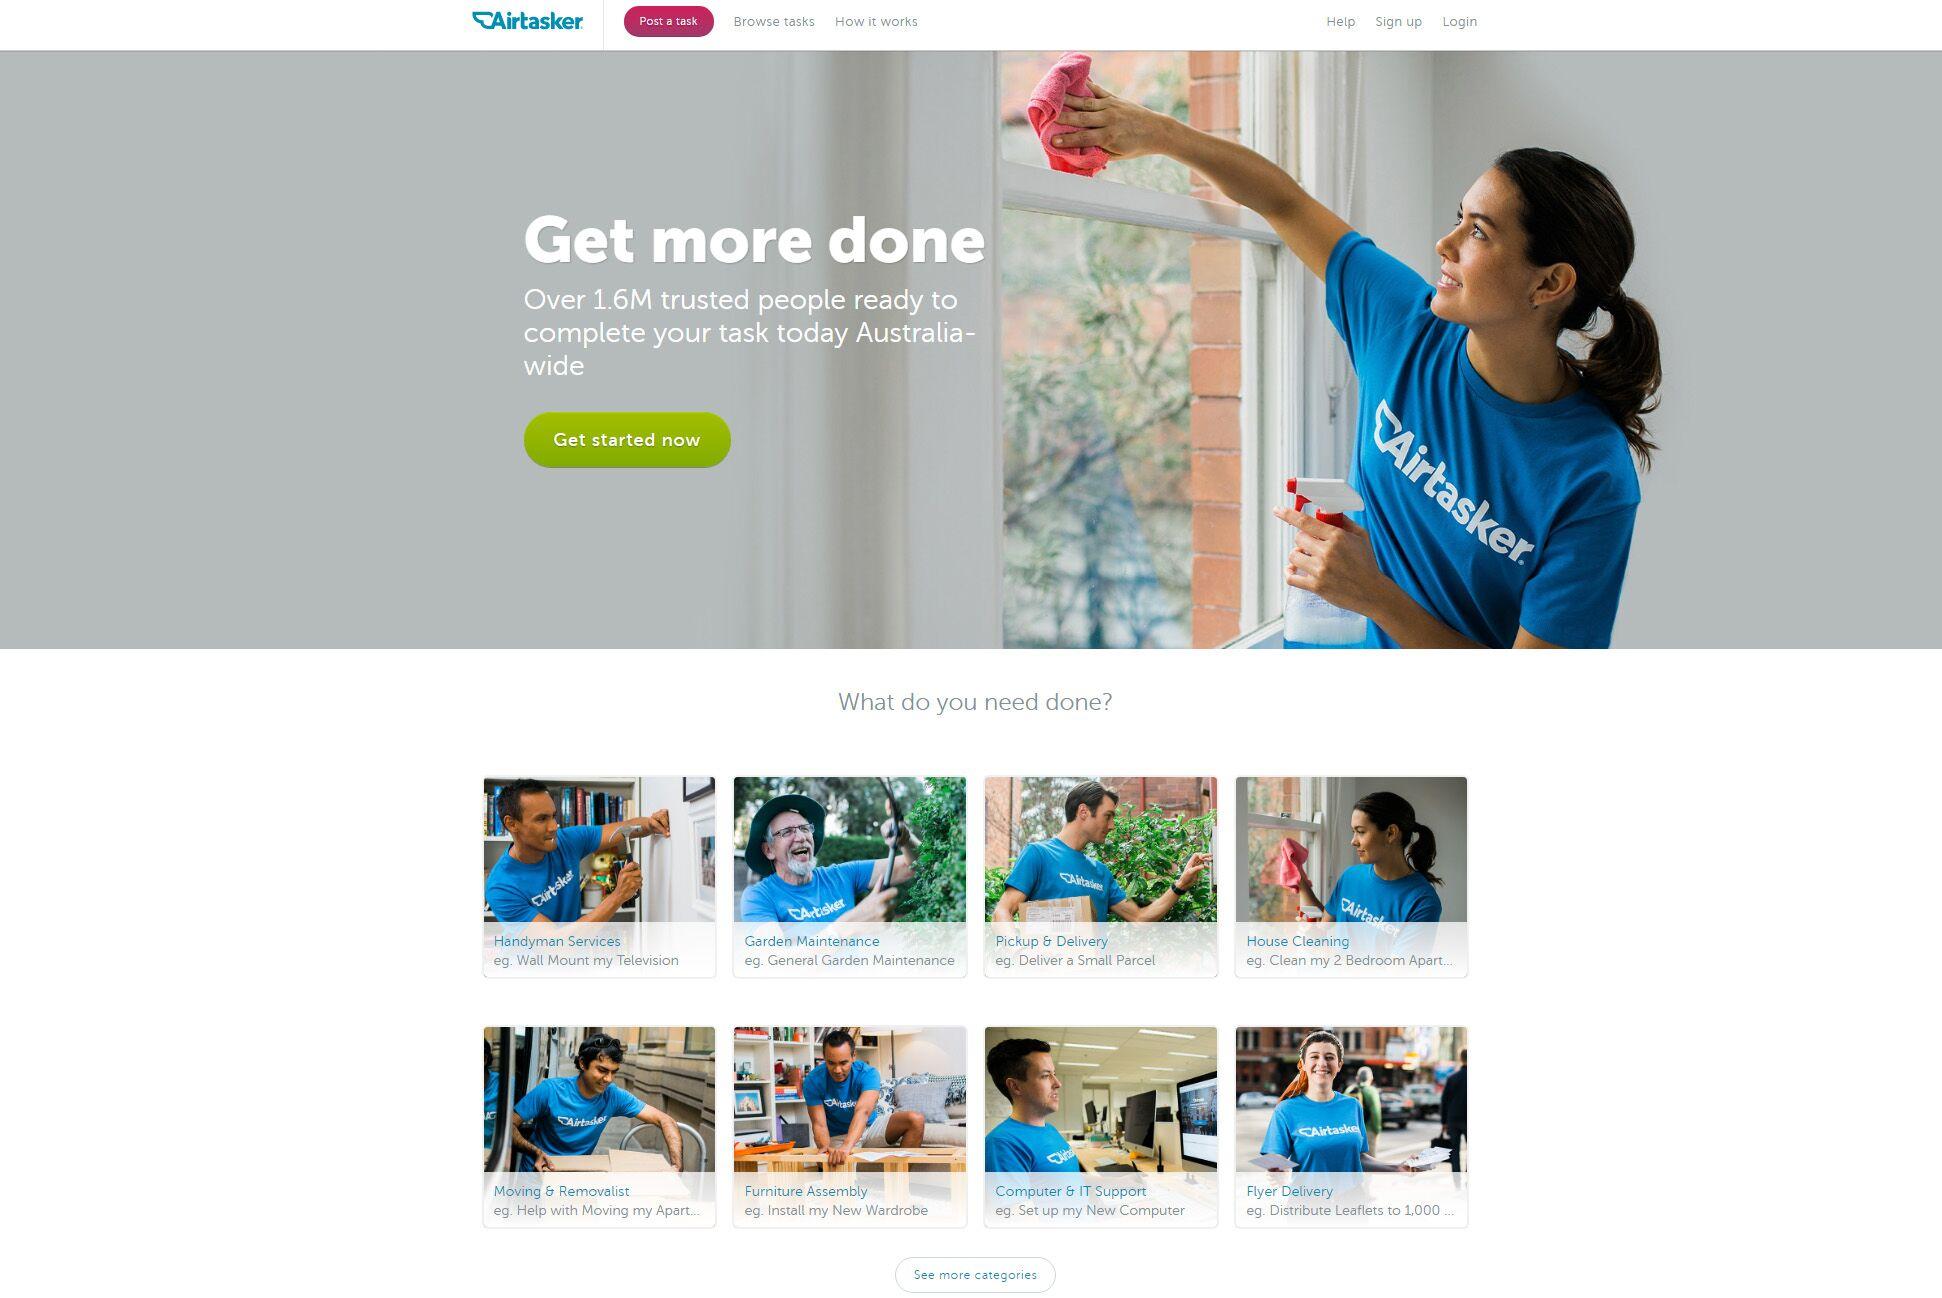 Airtasker Taking On Sharing Economy in TaskRabbit's Footsteps